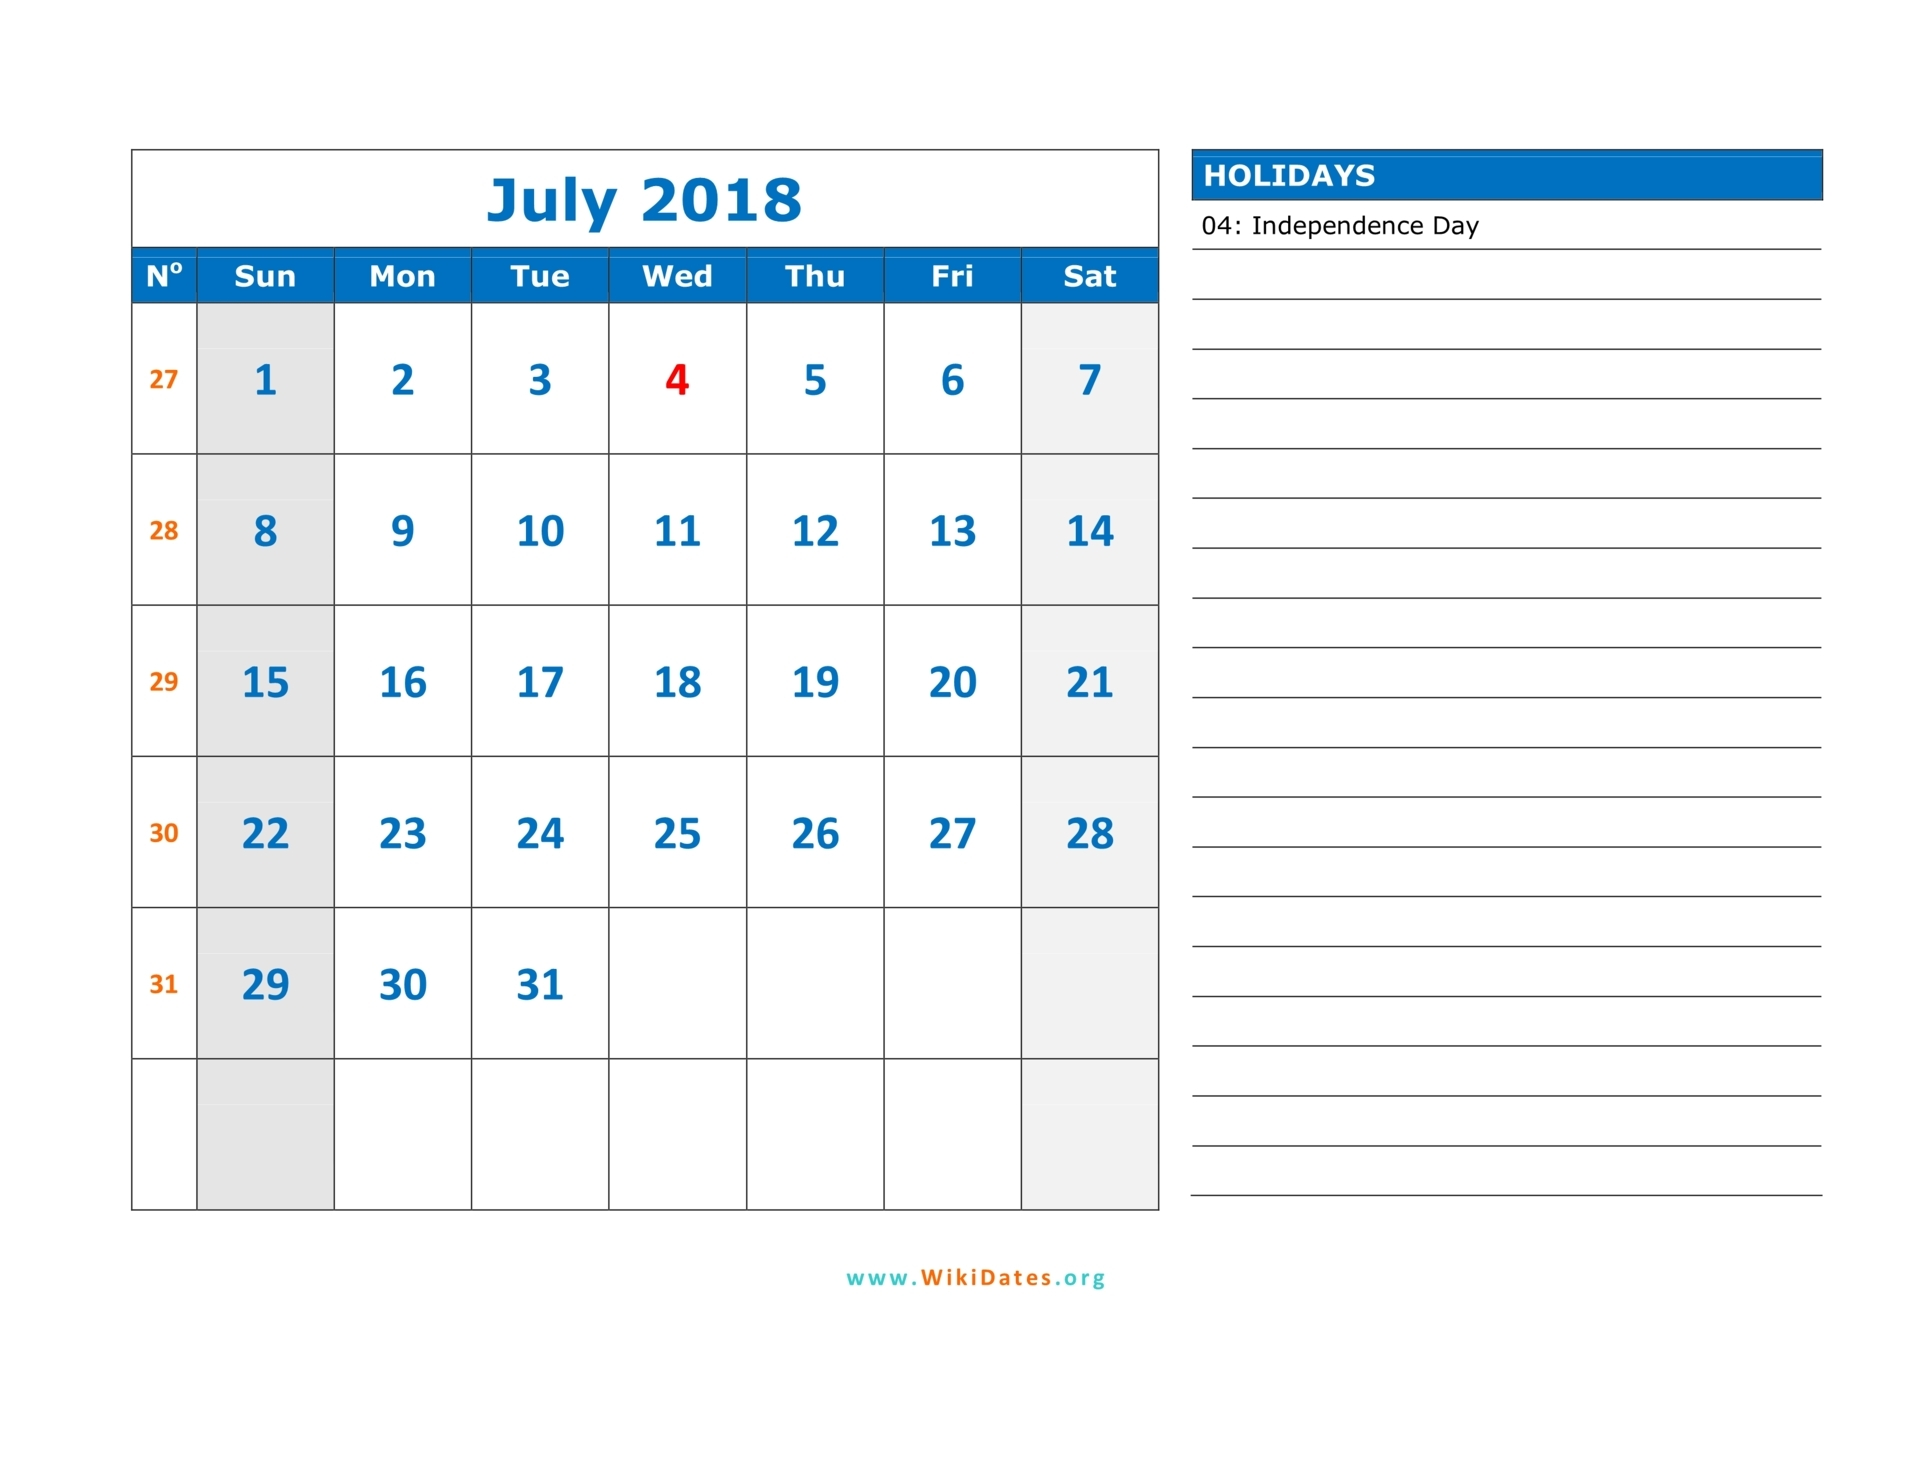 July 2018 Calendar WikiDates Org